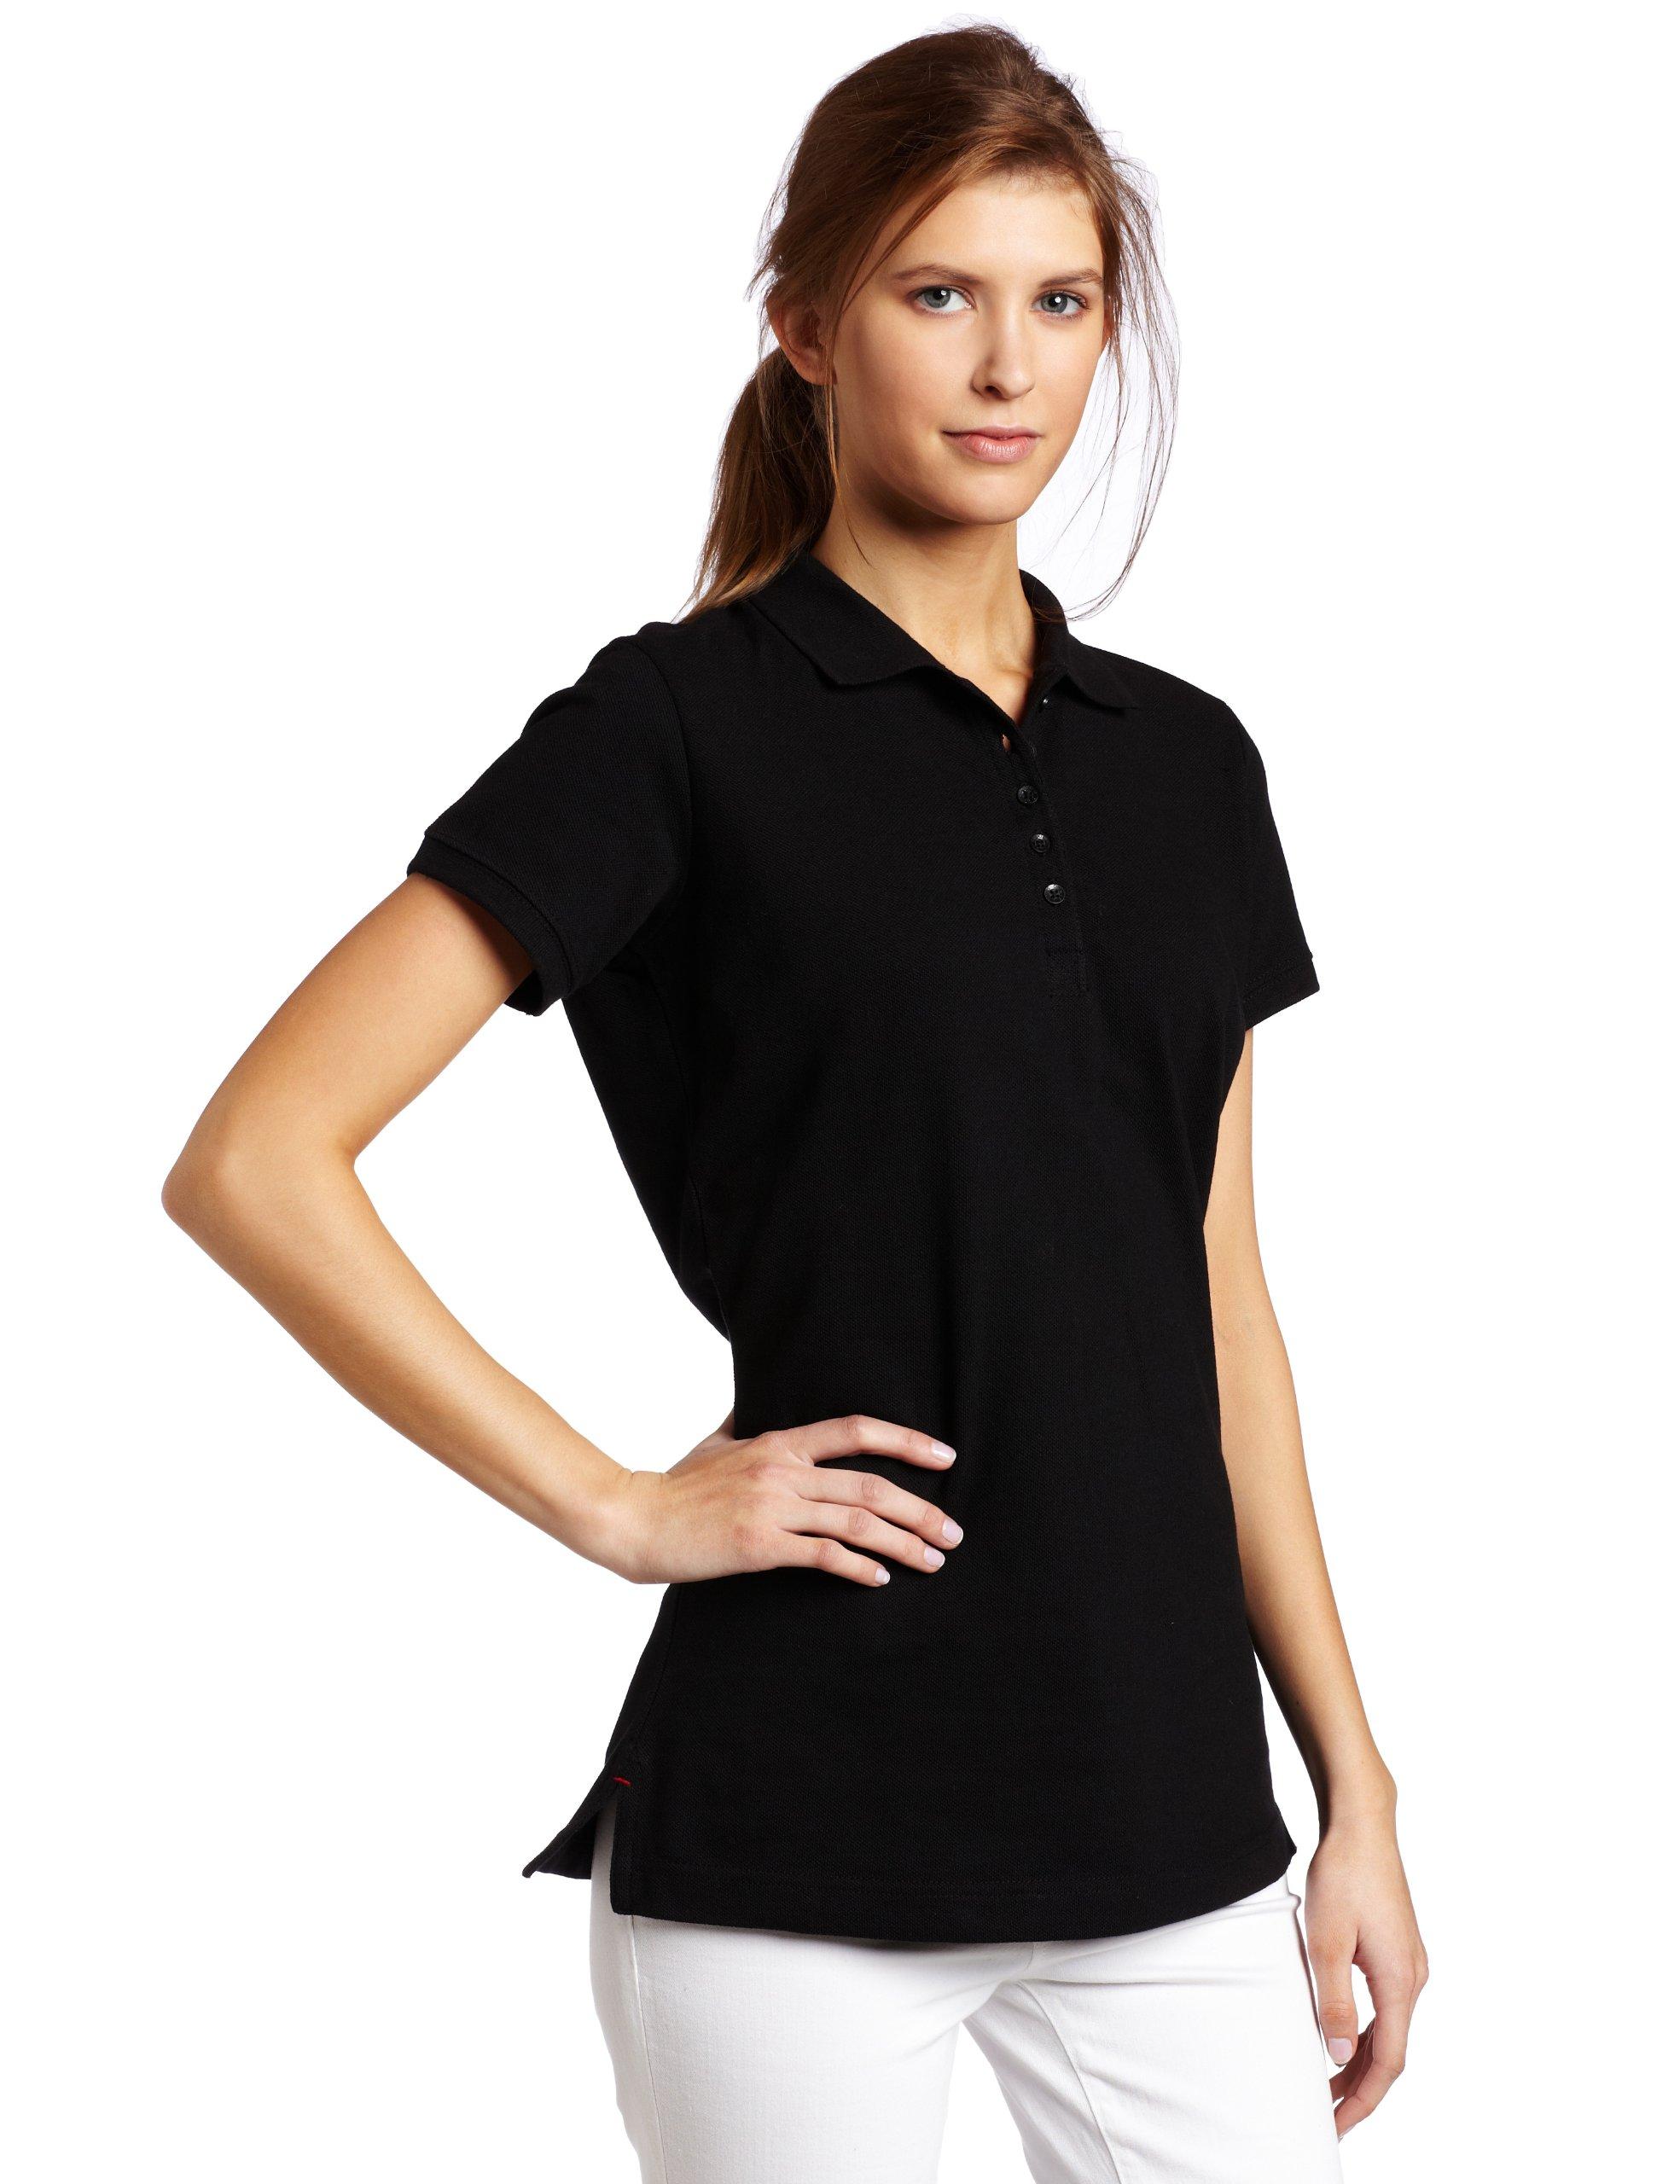 Dickies Women's Pique Polo Shirt, Black, Small